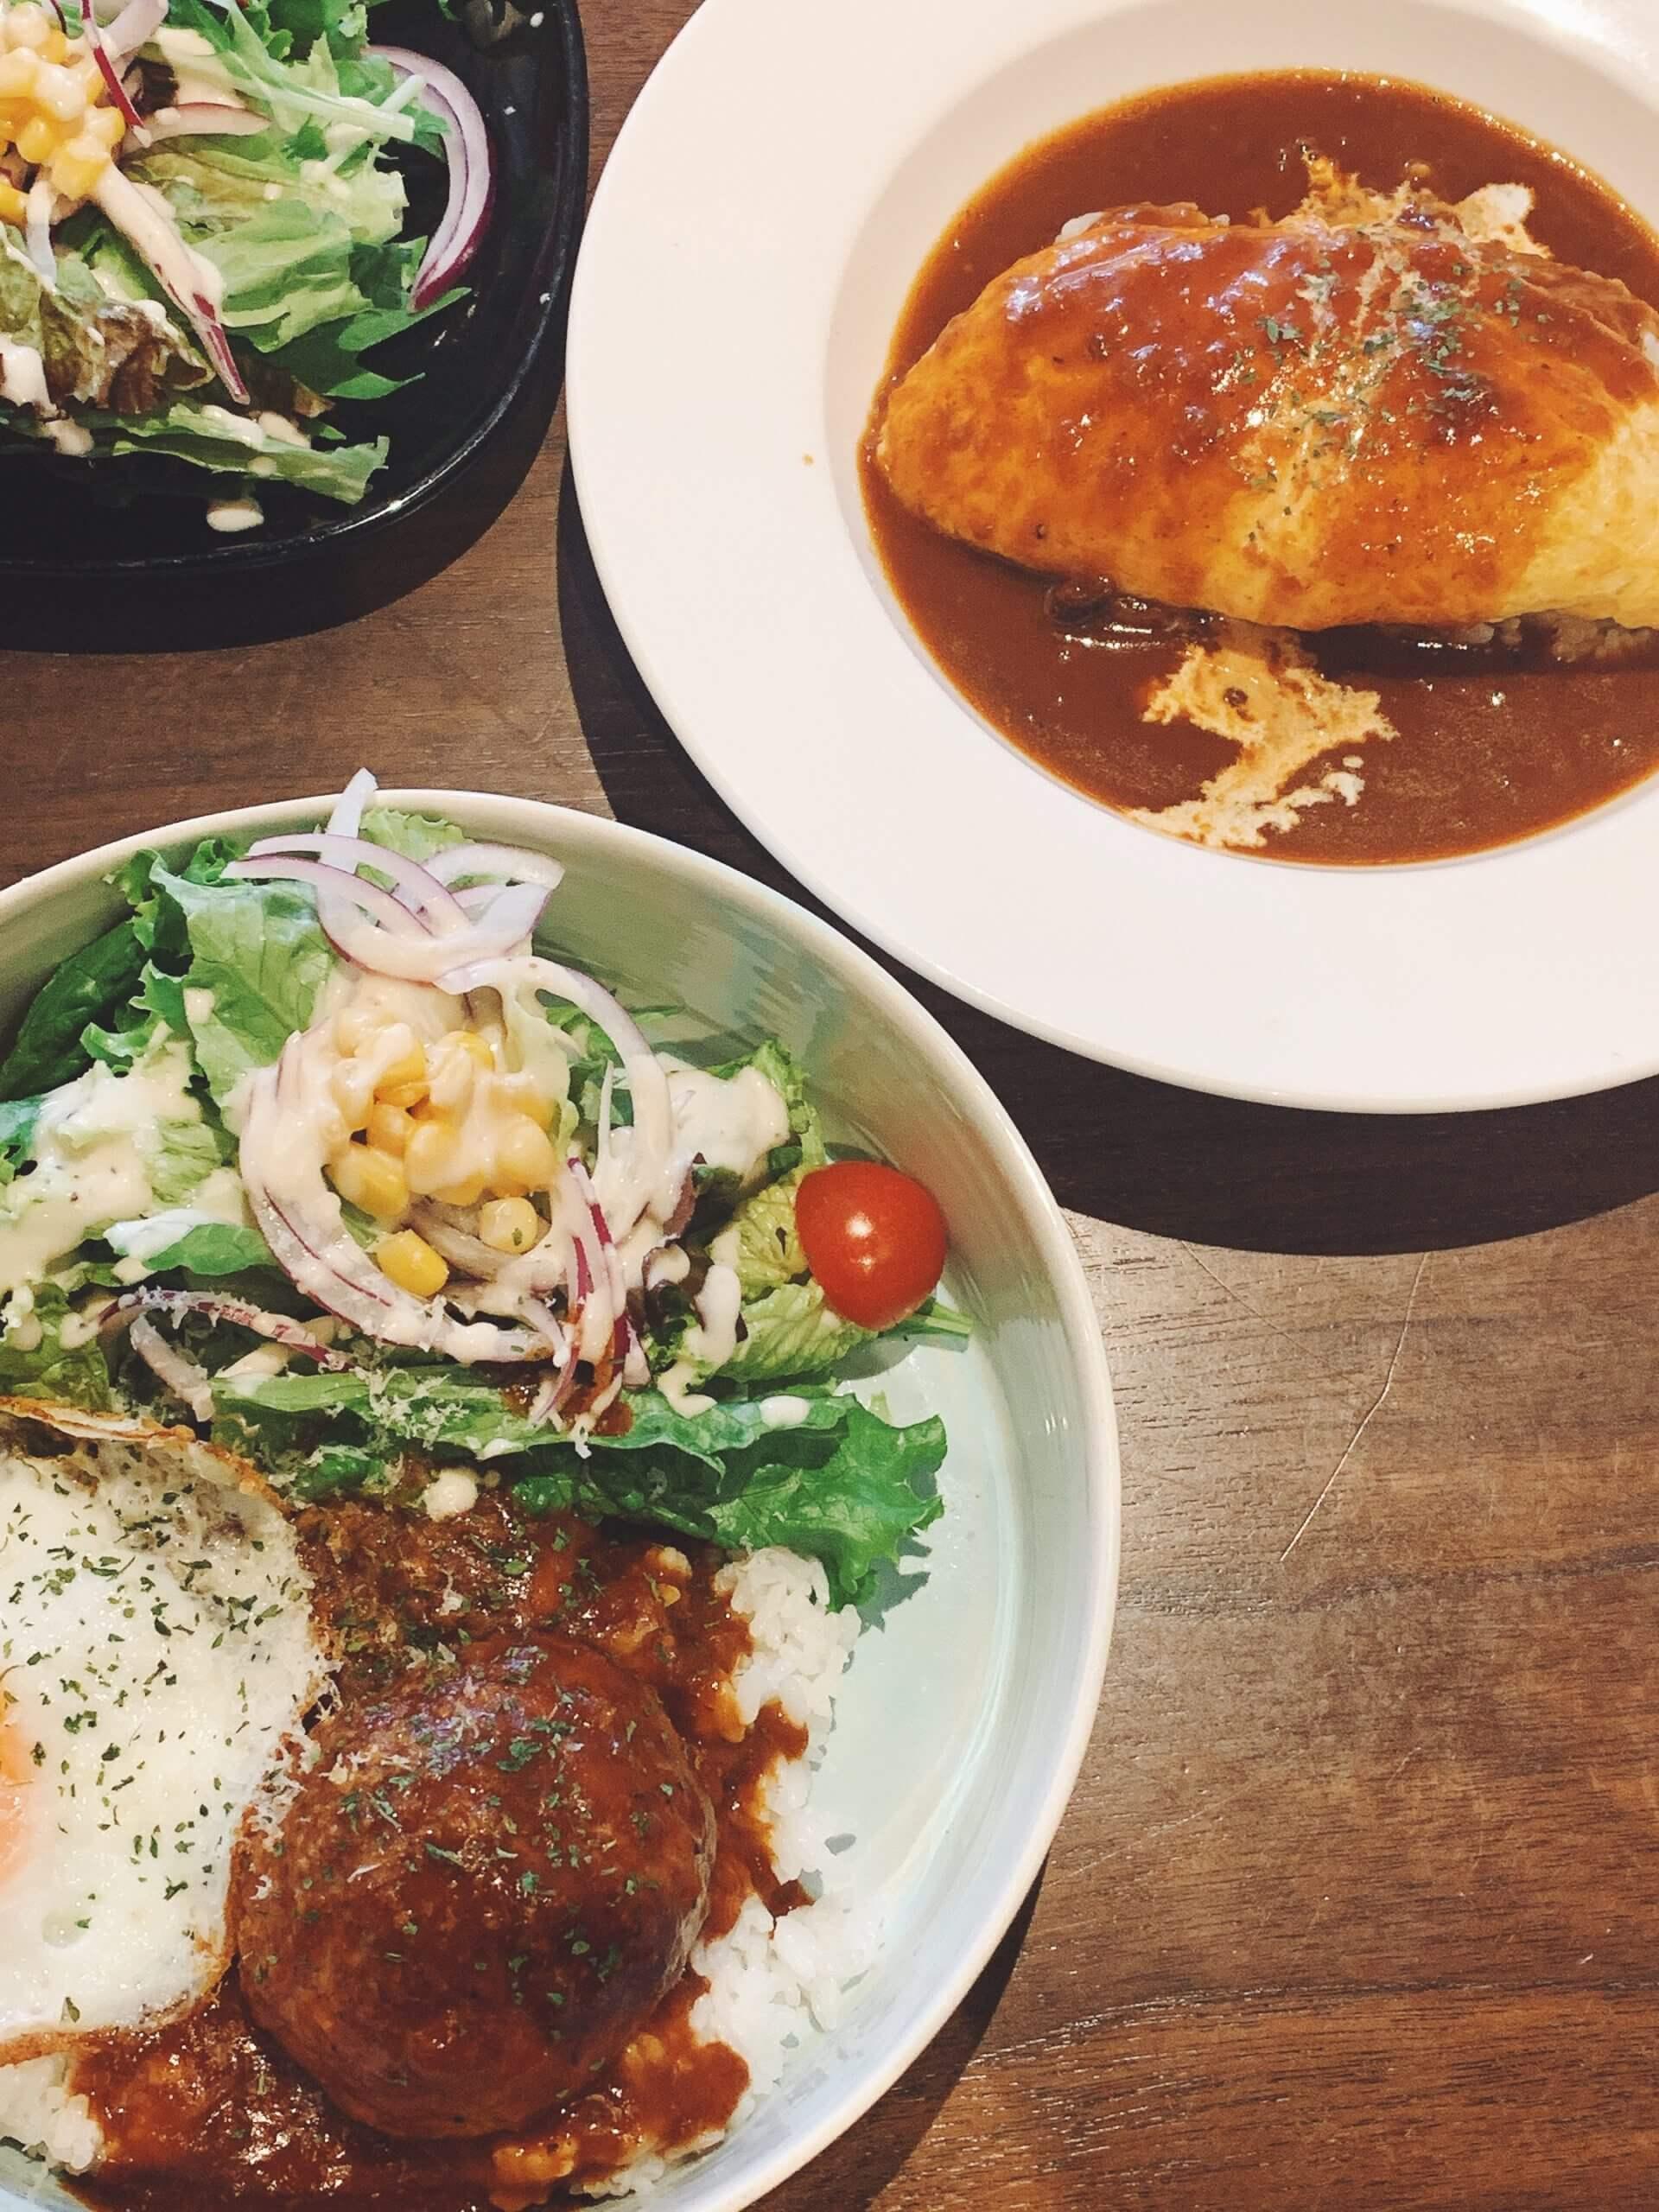 【Australian Cafe&Bar Manly 熊本-マンリー】オシャレな空間で最高のランチを楽しめる!《熊本市中央区南坪井町》